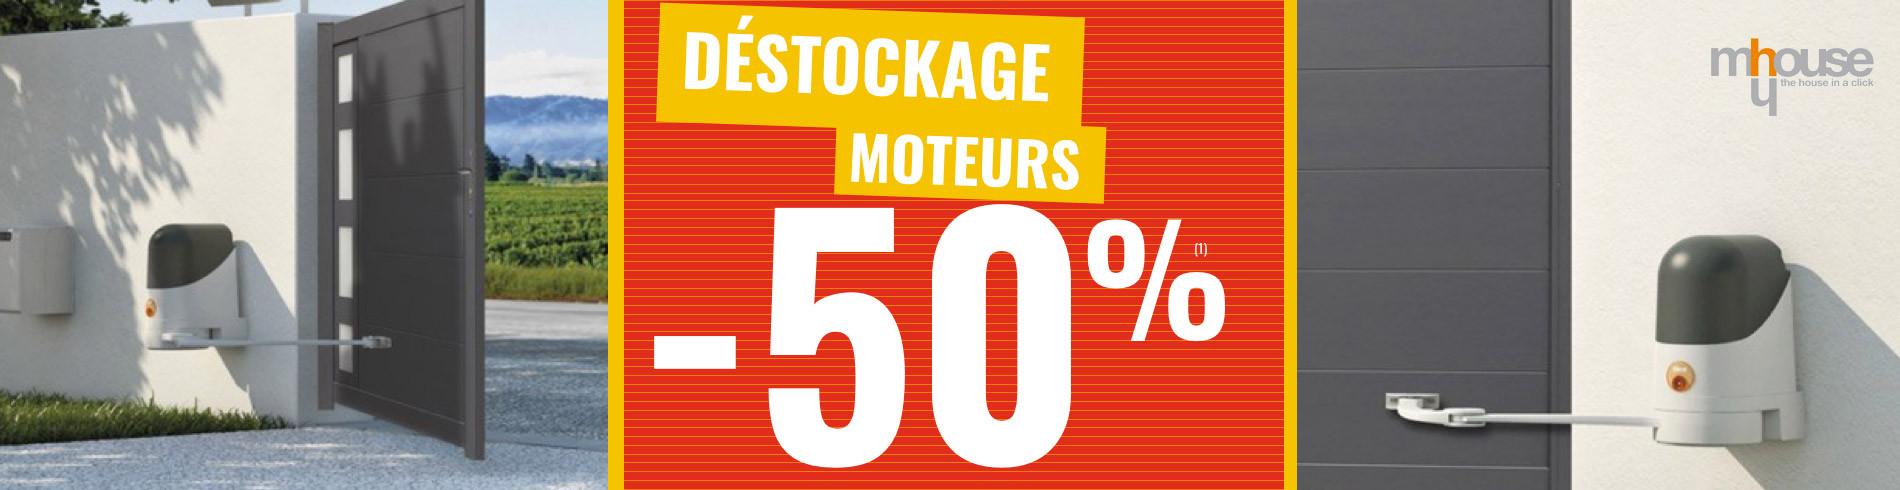 Destockage motorisation